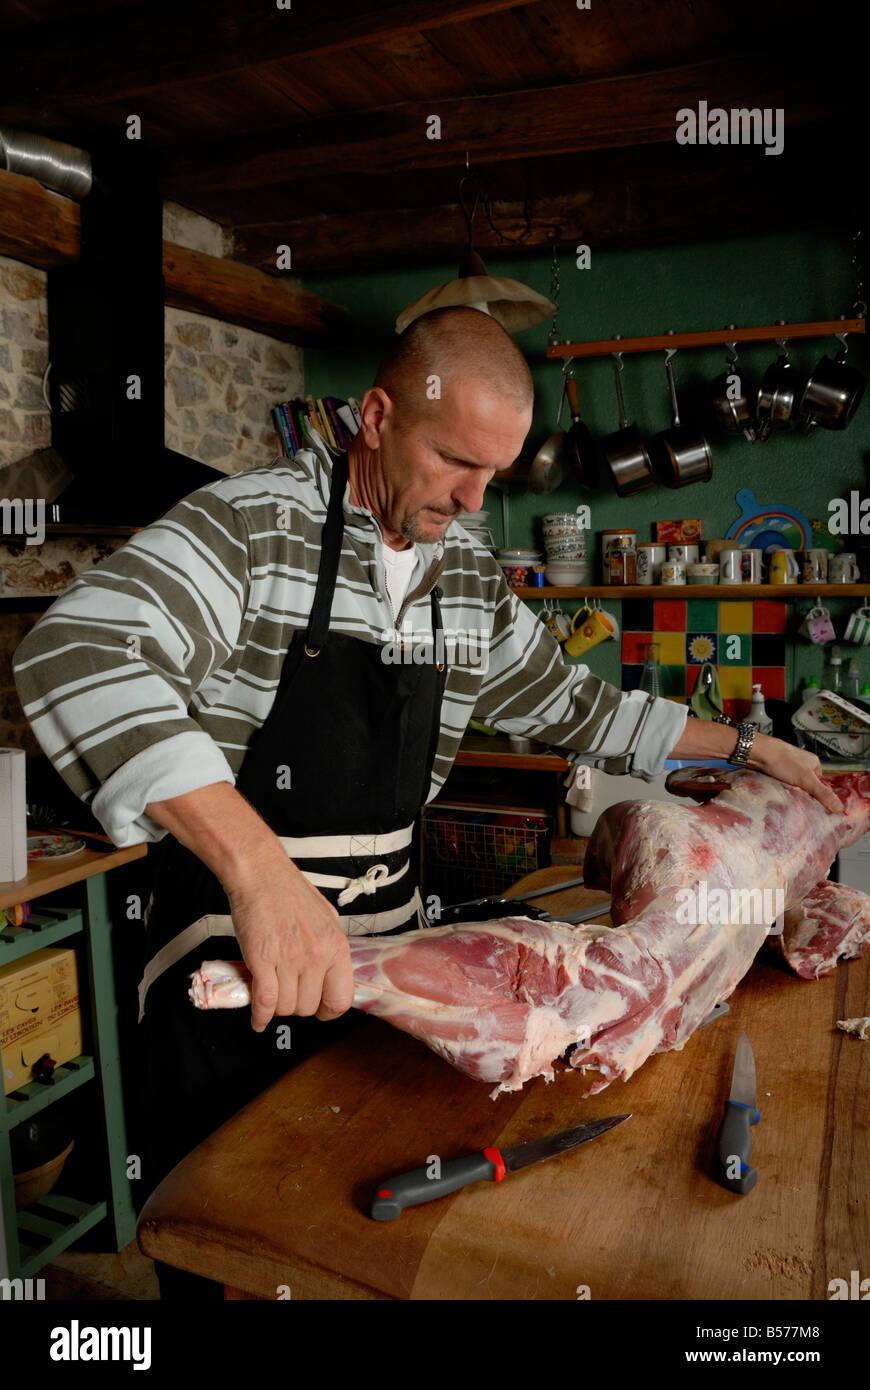 Stock photo of a man butchering a lamb - Stock Image